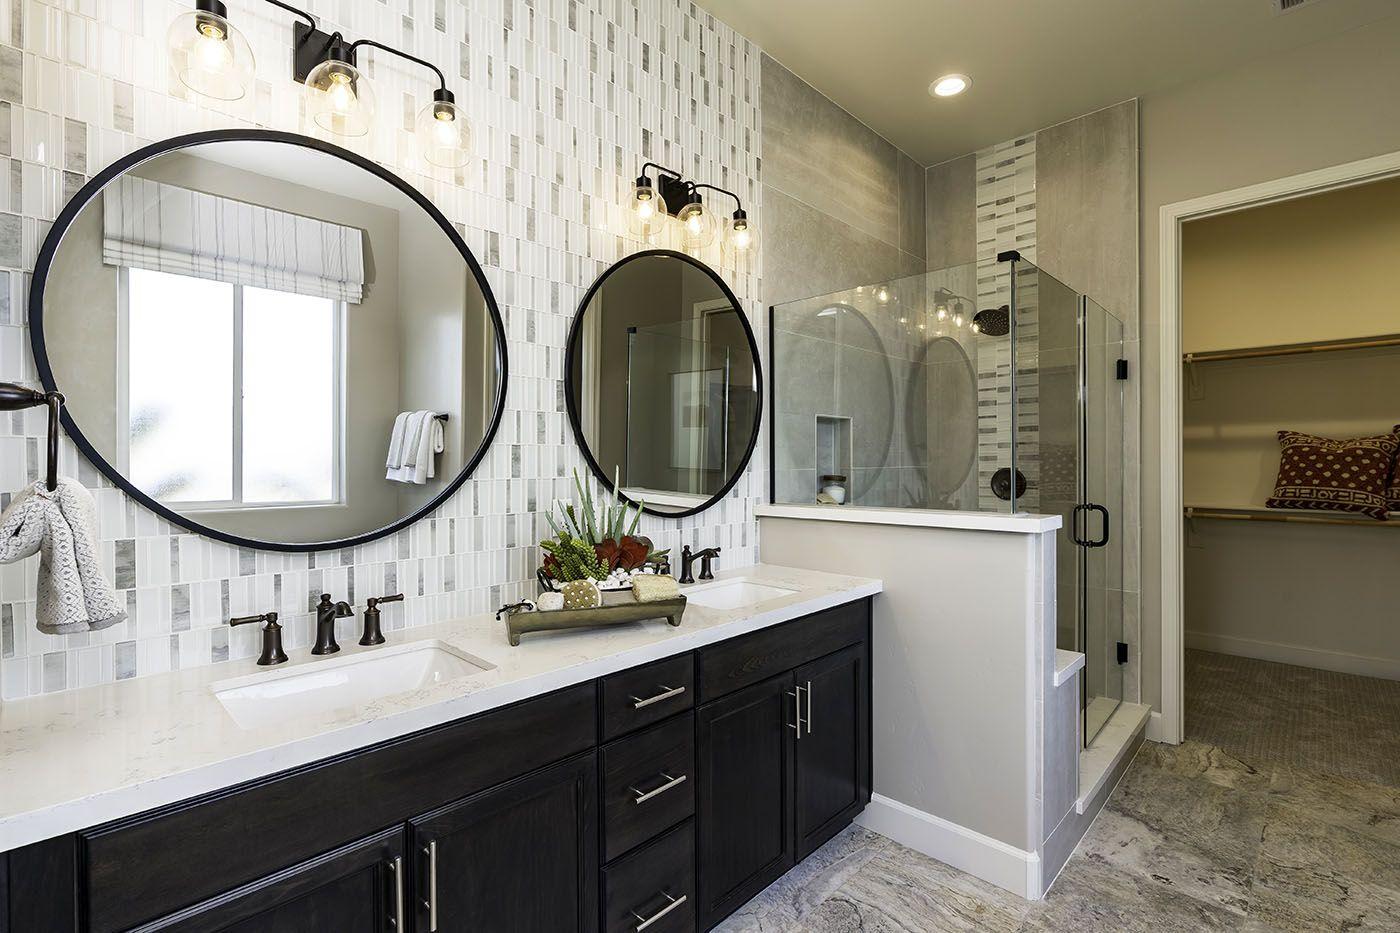 Bathroom featured in the Ashford By Coastal Community Builders in Santa Barbara, CA